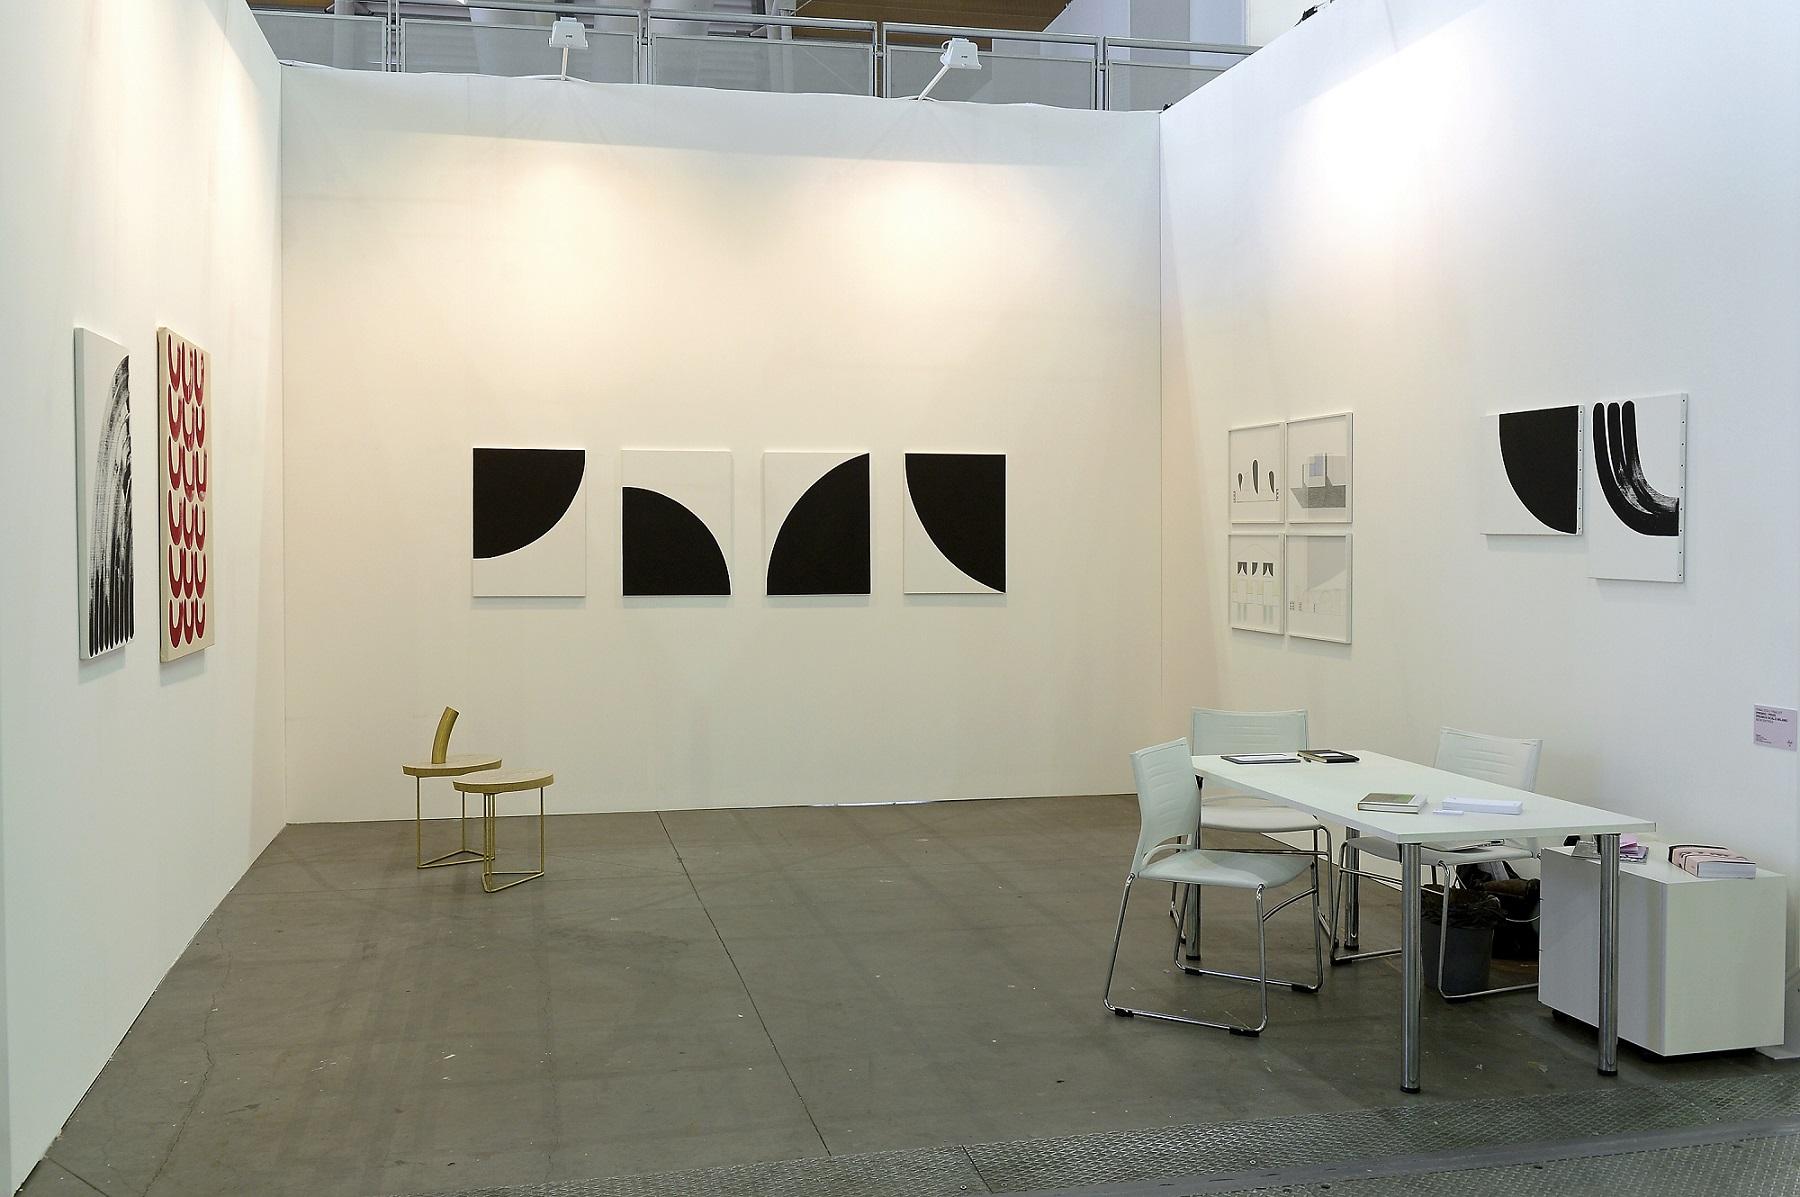 artissima 2015 i vincitori dei premi sardi per l arte. Black Bedroom Furniture Sets. Home Design Ideas